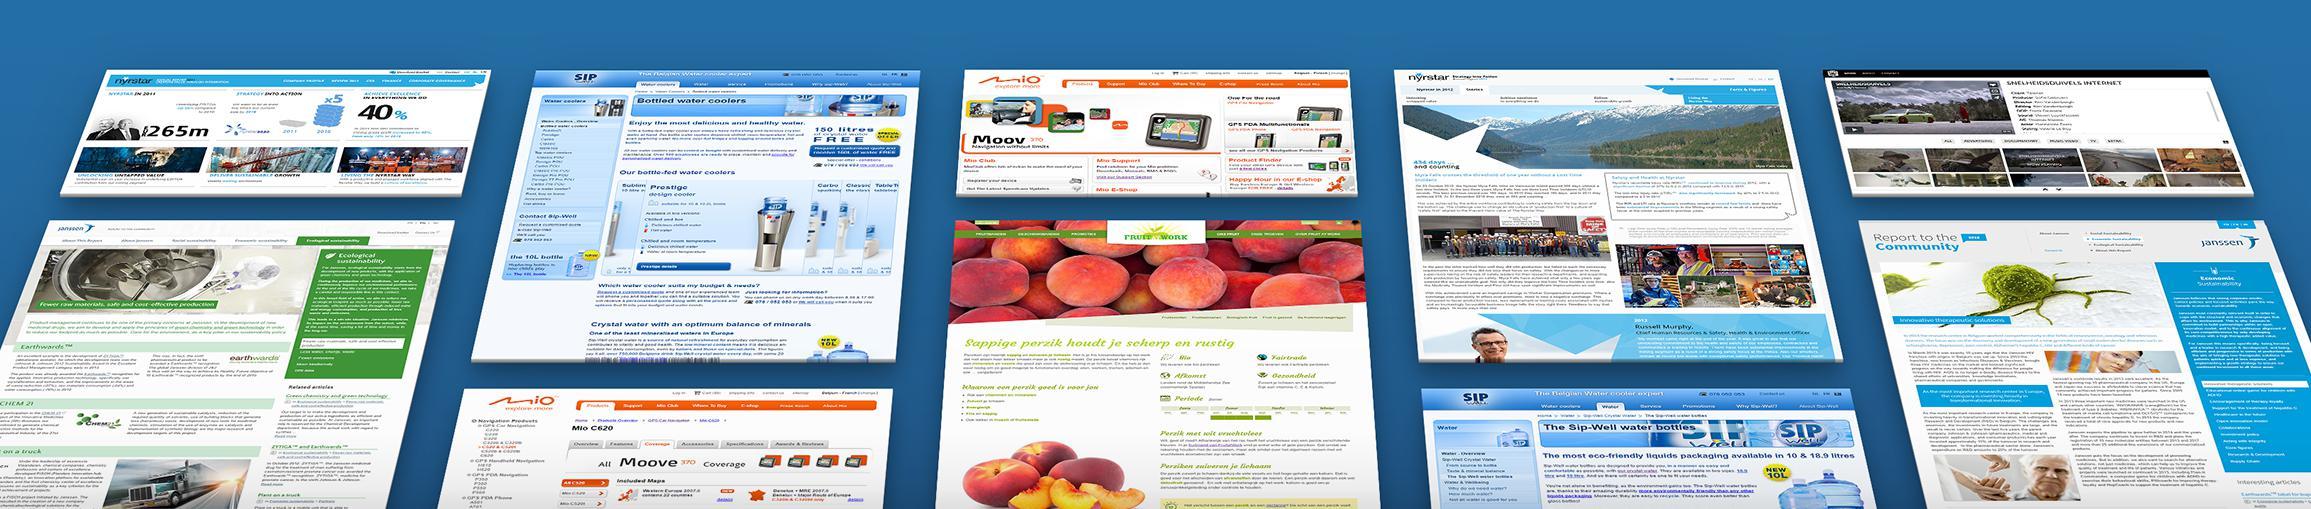 nl-portfolio-header.jpg